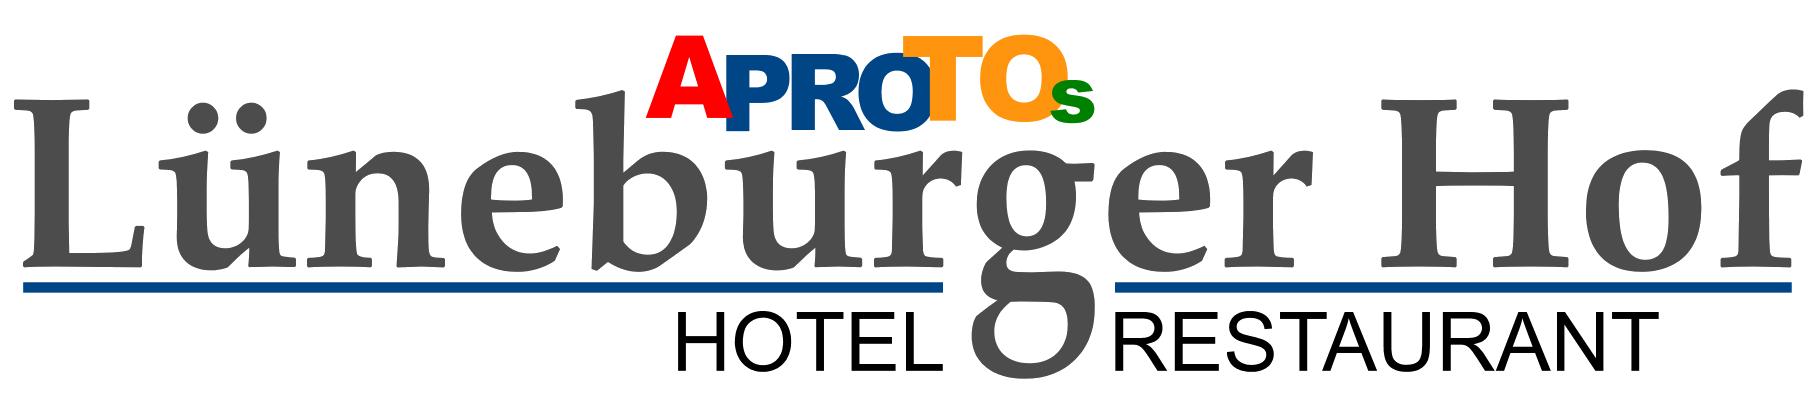 APROTOs Lüneburger Hof